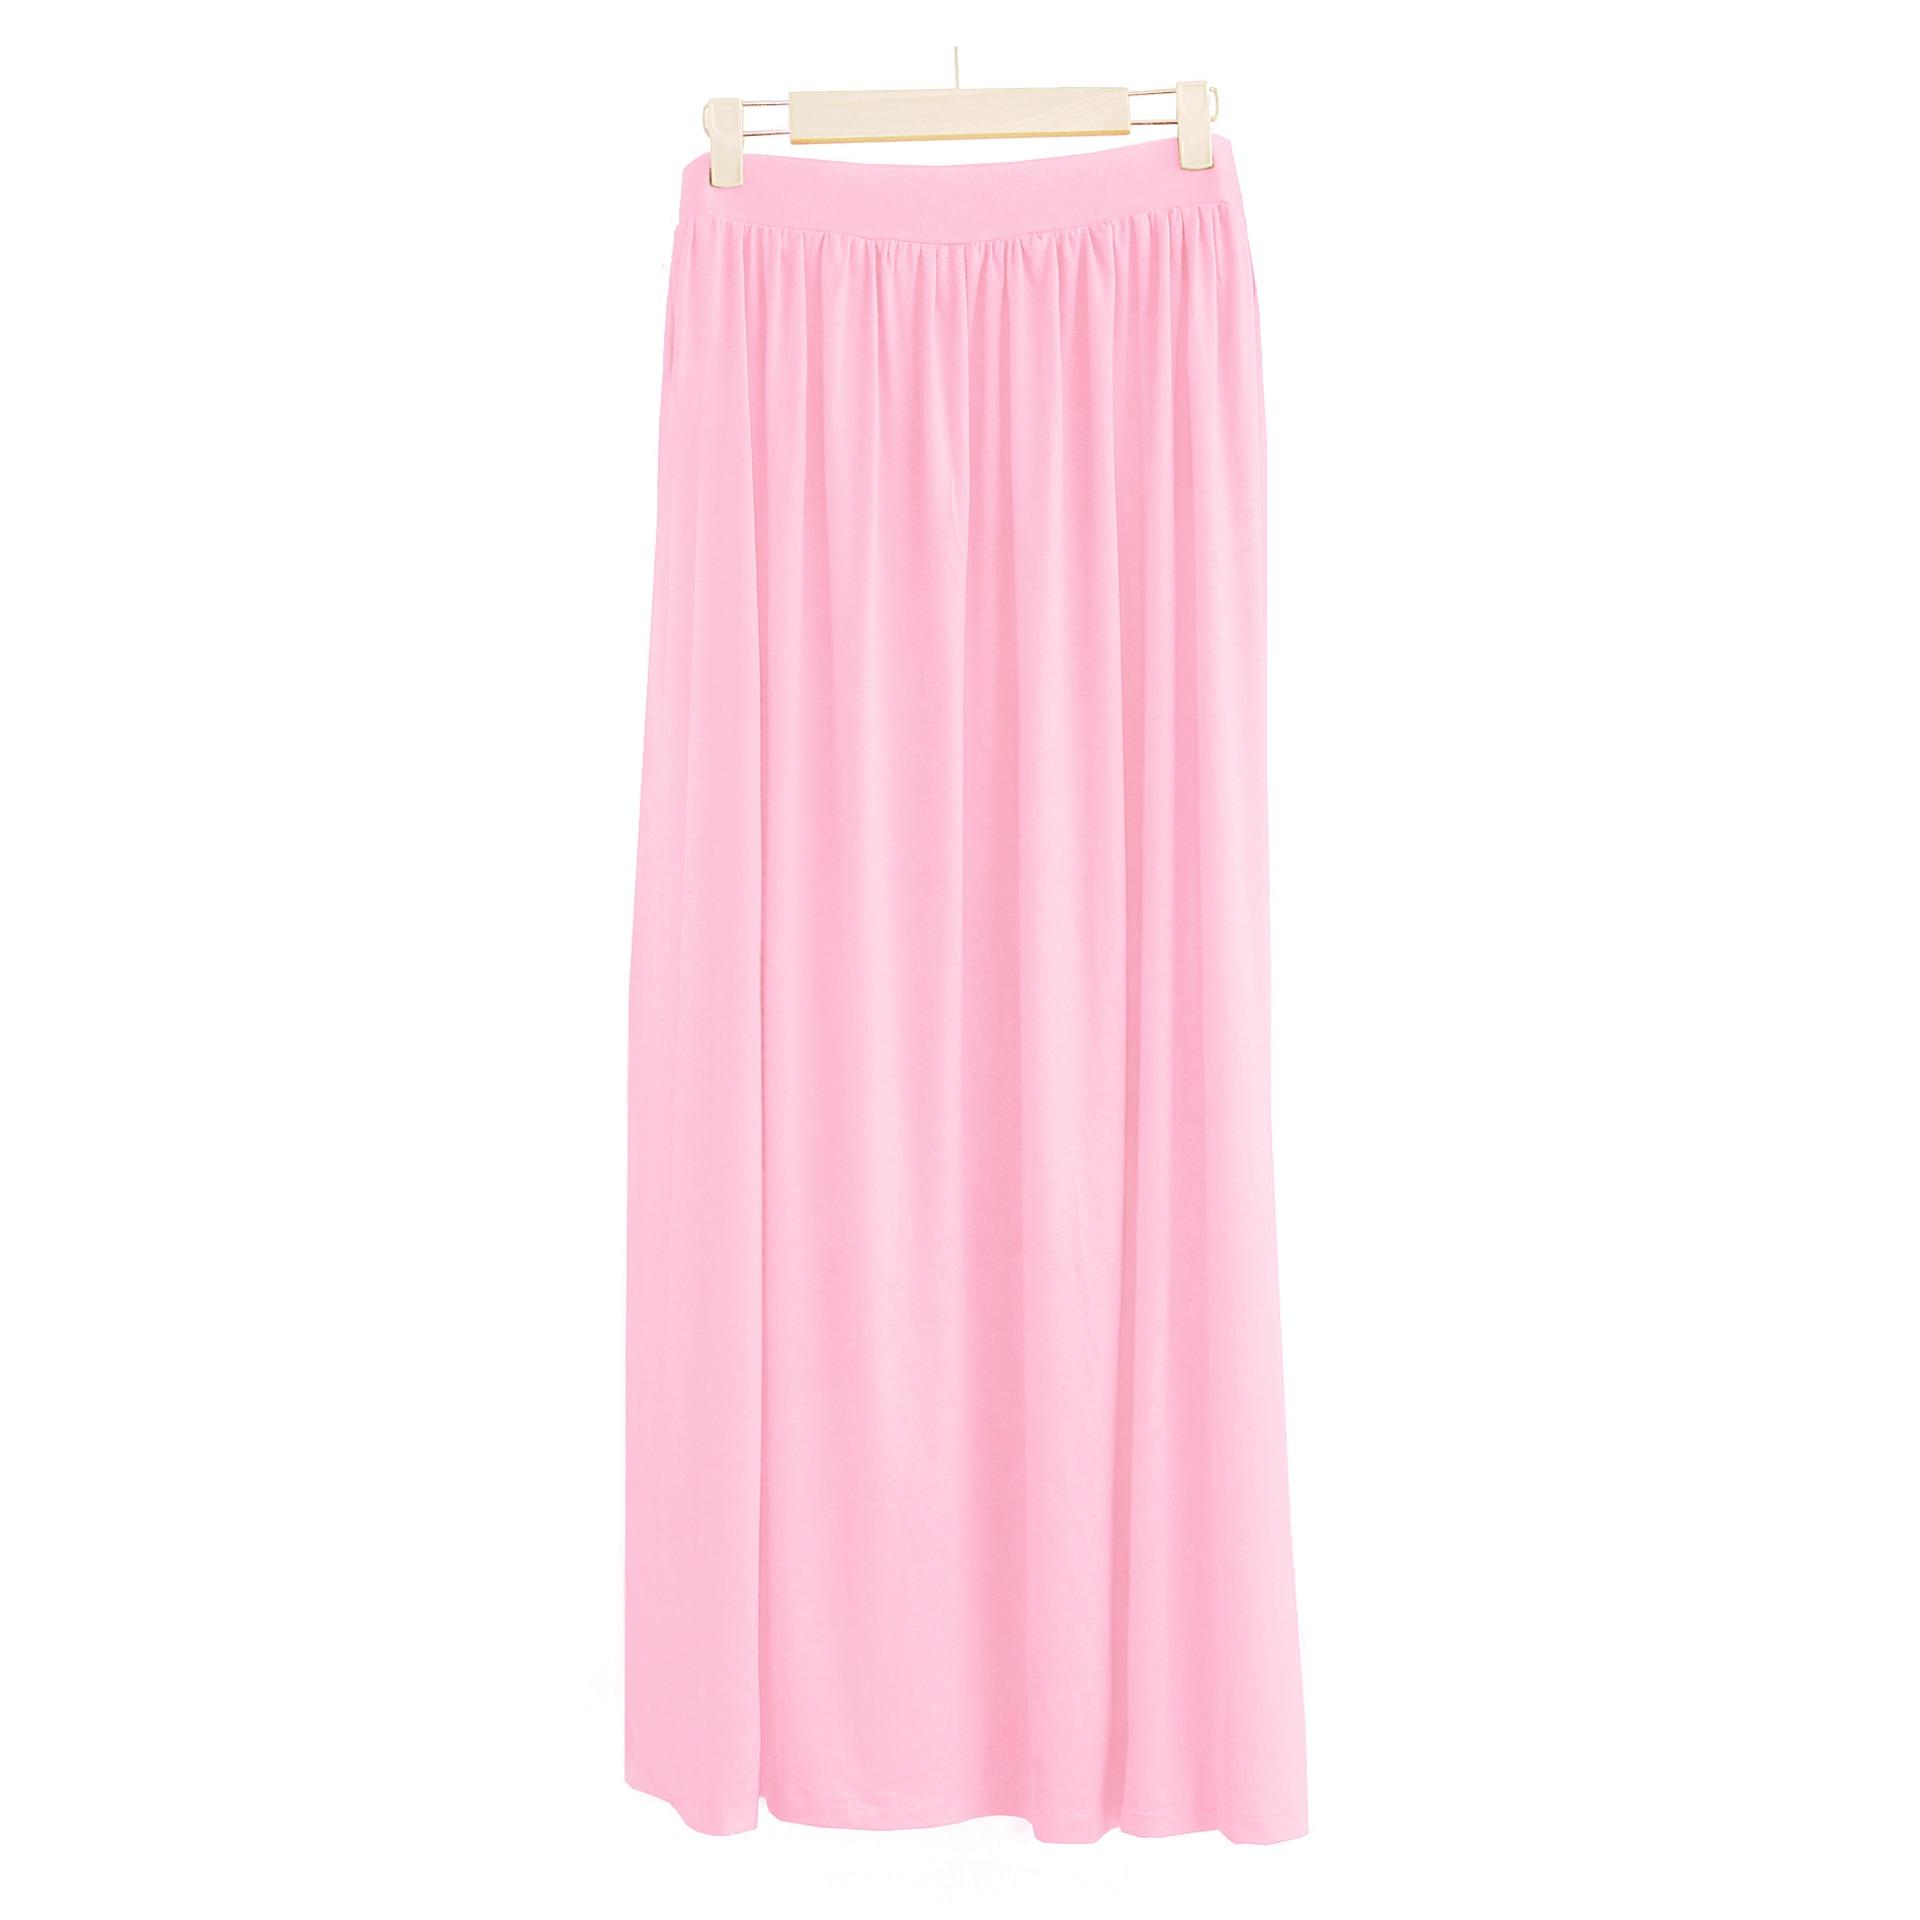 Tepung Gasol Beras Coklat Bubur Bayi Organik Mpasi Daftar Harga Merah Cottonheaven Rok Kaos Maxi Nadhifa 27 Warna Baby Pink Lazada Indonesia